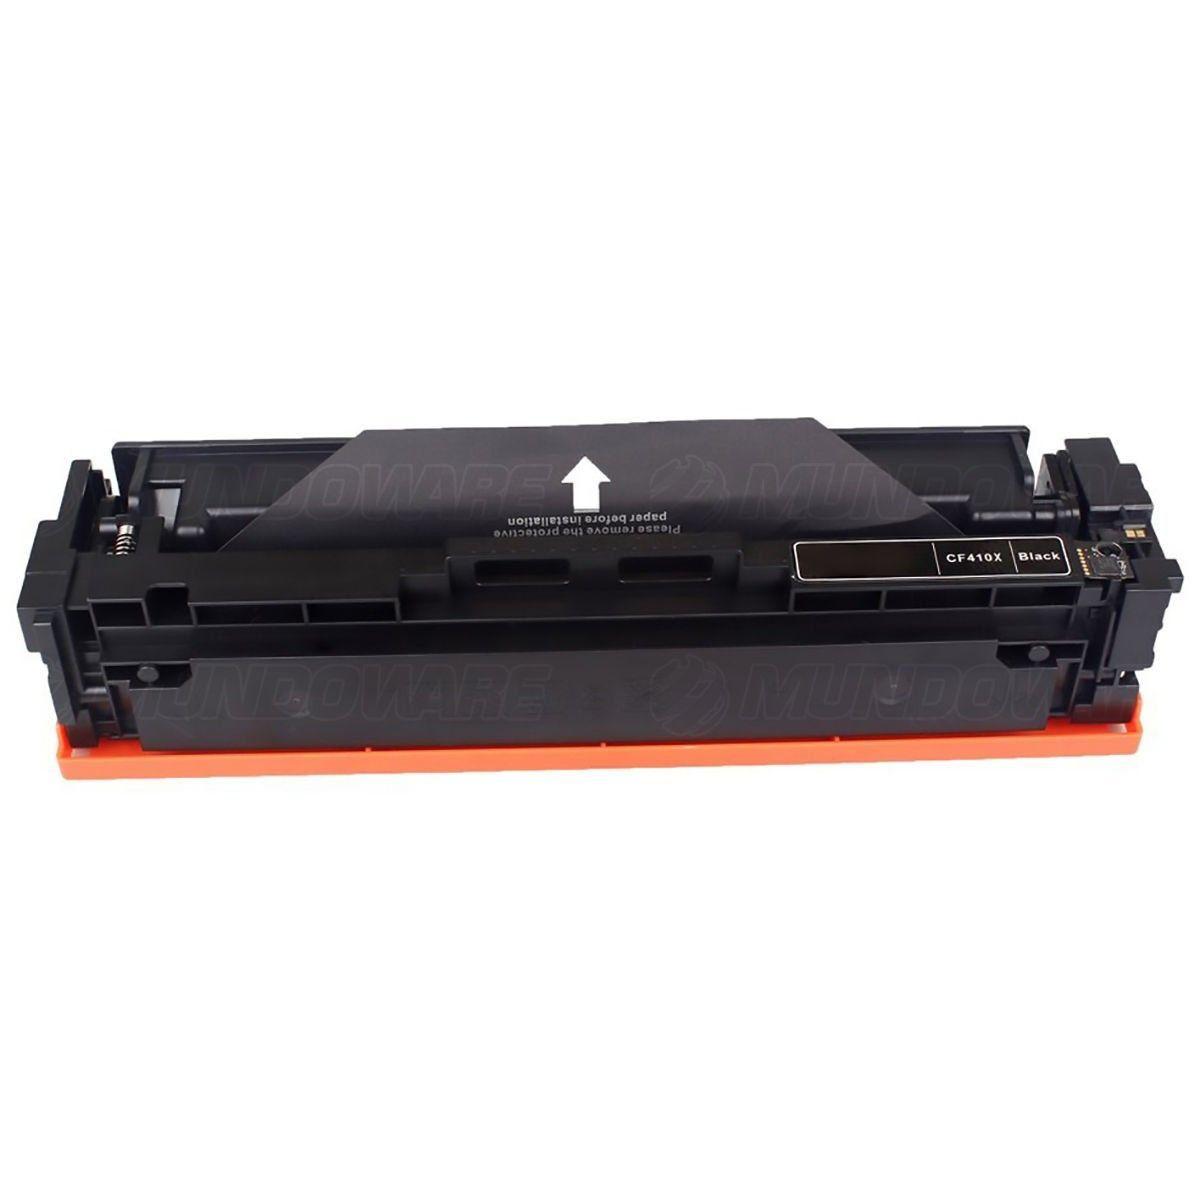 Compatível: Toner CF410X 410X para Impressora HP M477fdw M452dn M477fnw M452nw M477 M452 M-477fdw / Preto / 6.500